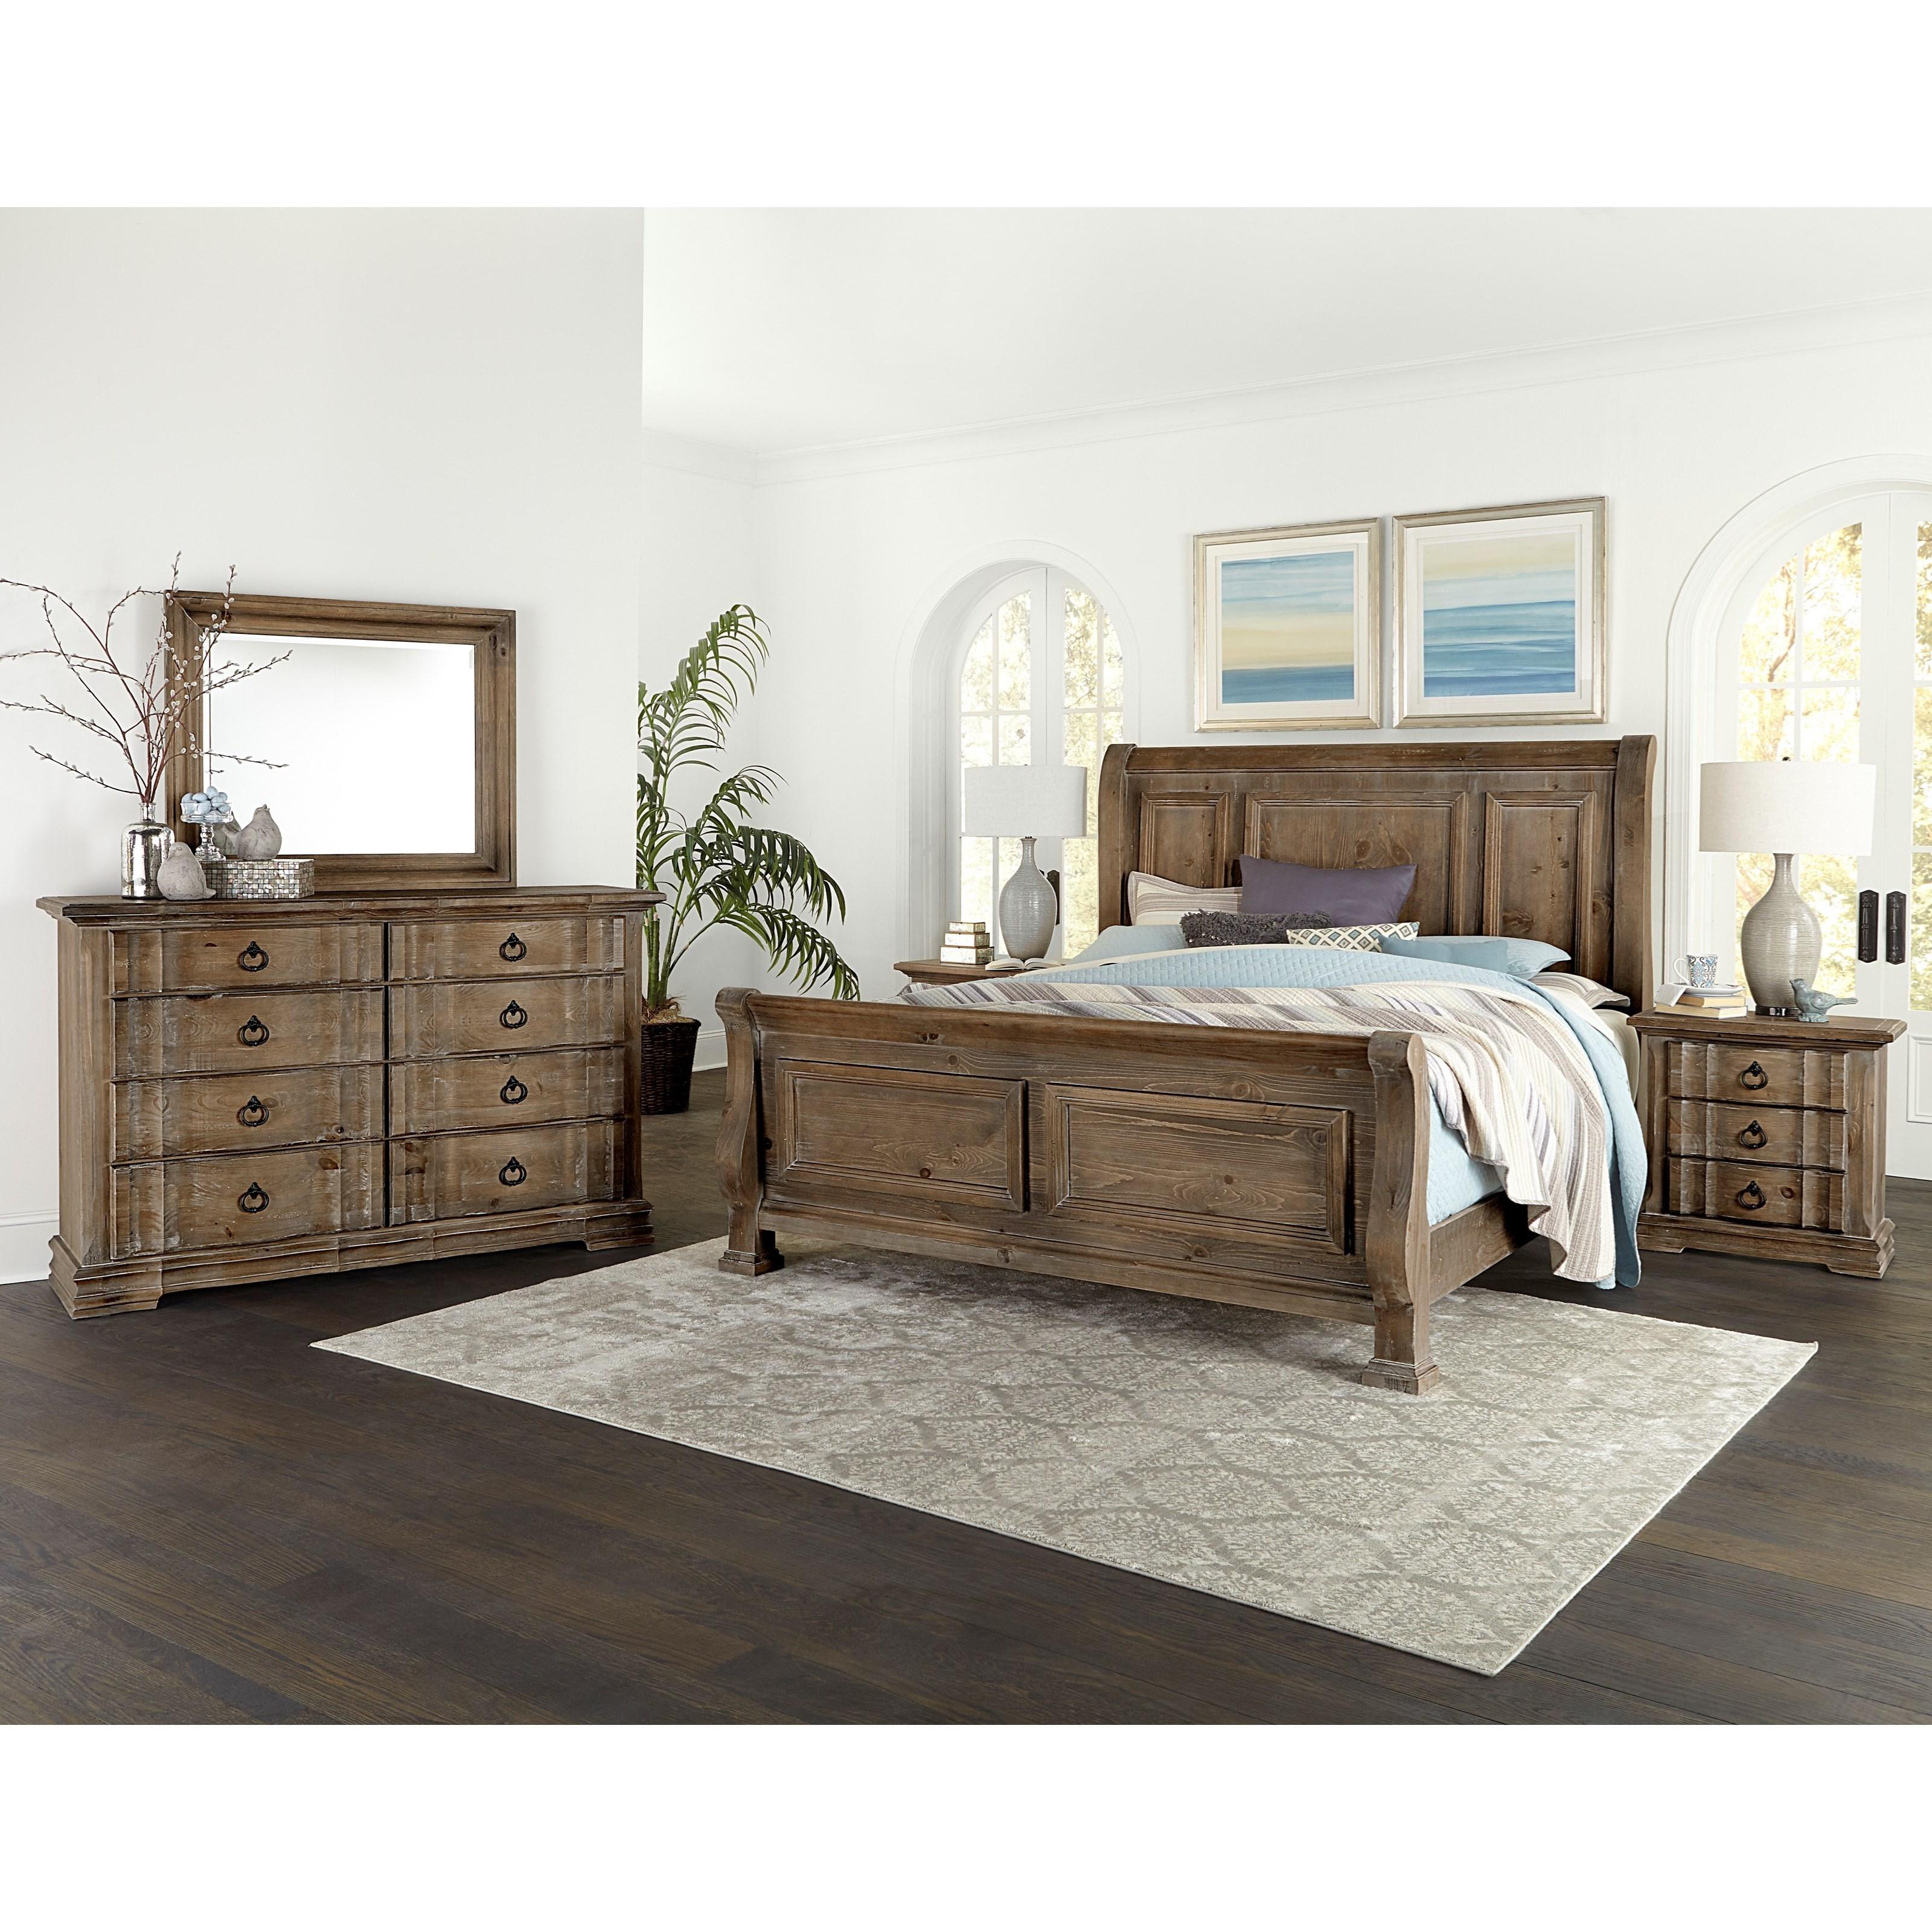 Vaughan Bassett Rustic Hills Cottage Style Queen Sleigh Bed Mueller Furniture Sleigh Beds